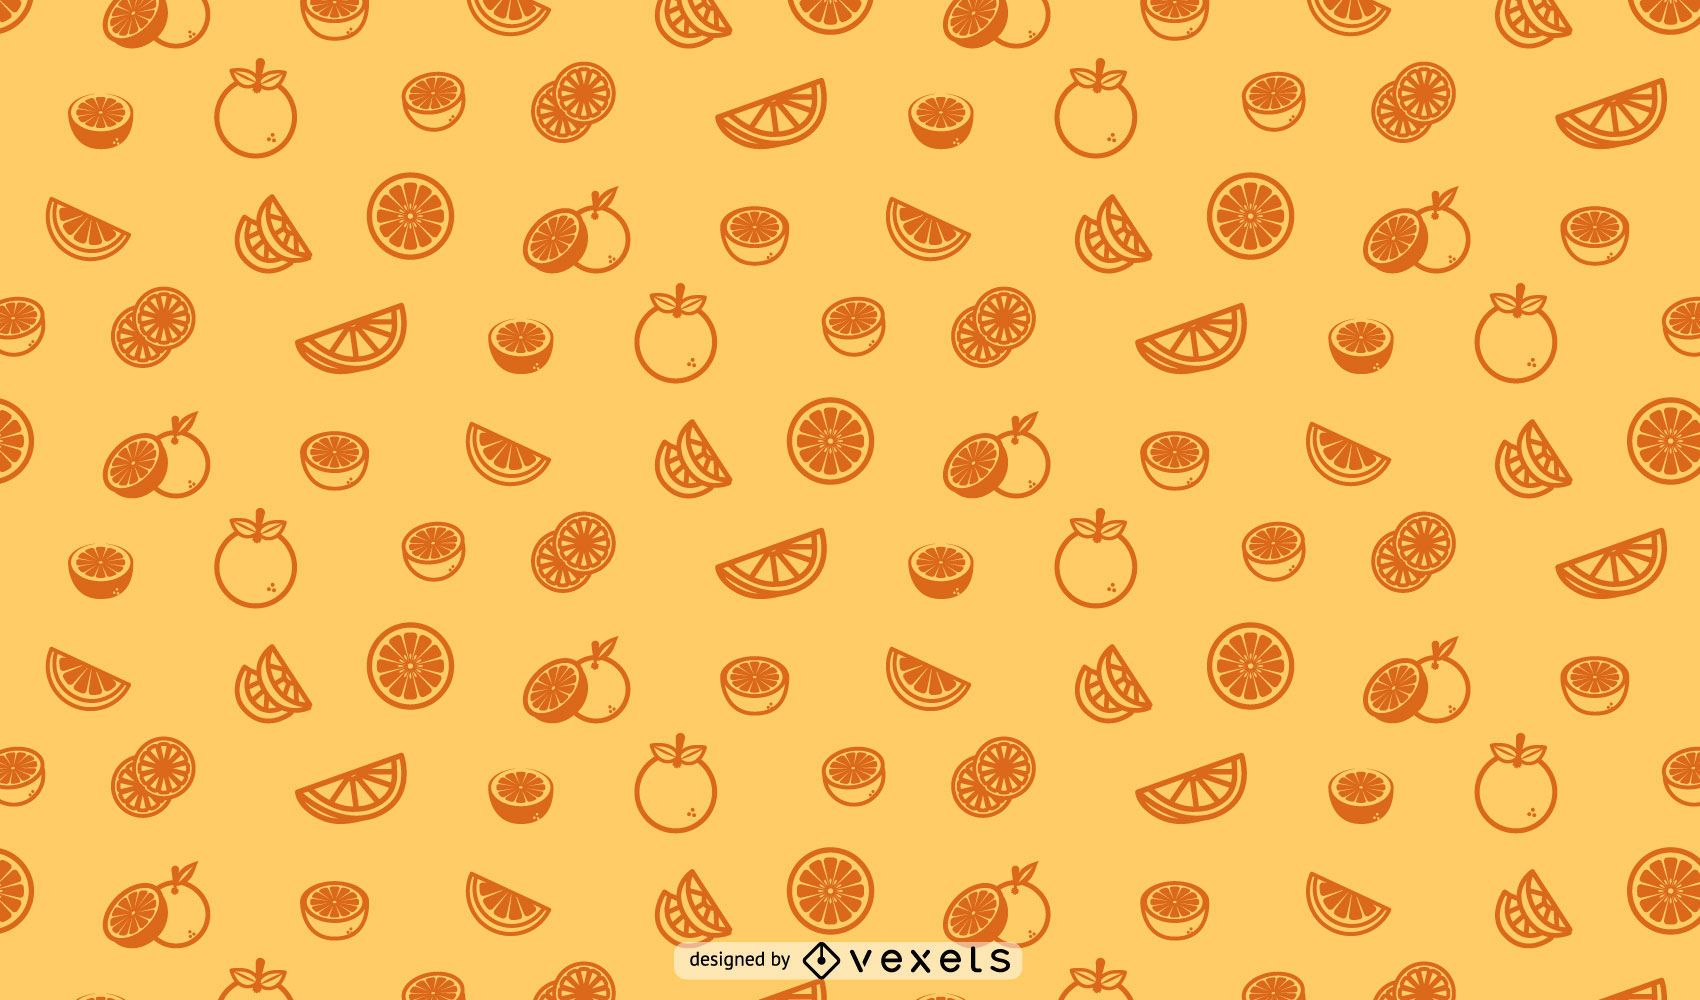 Oranges seamless pattern design